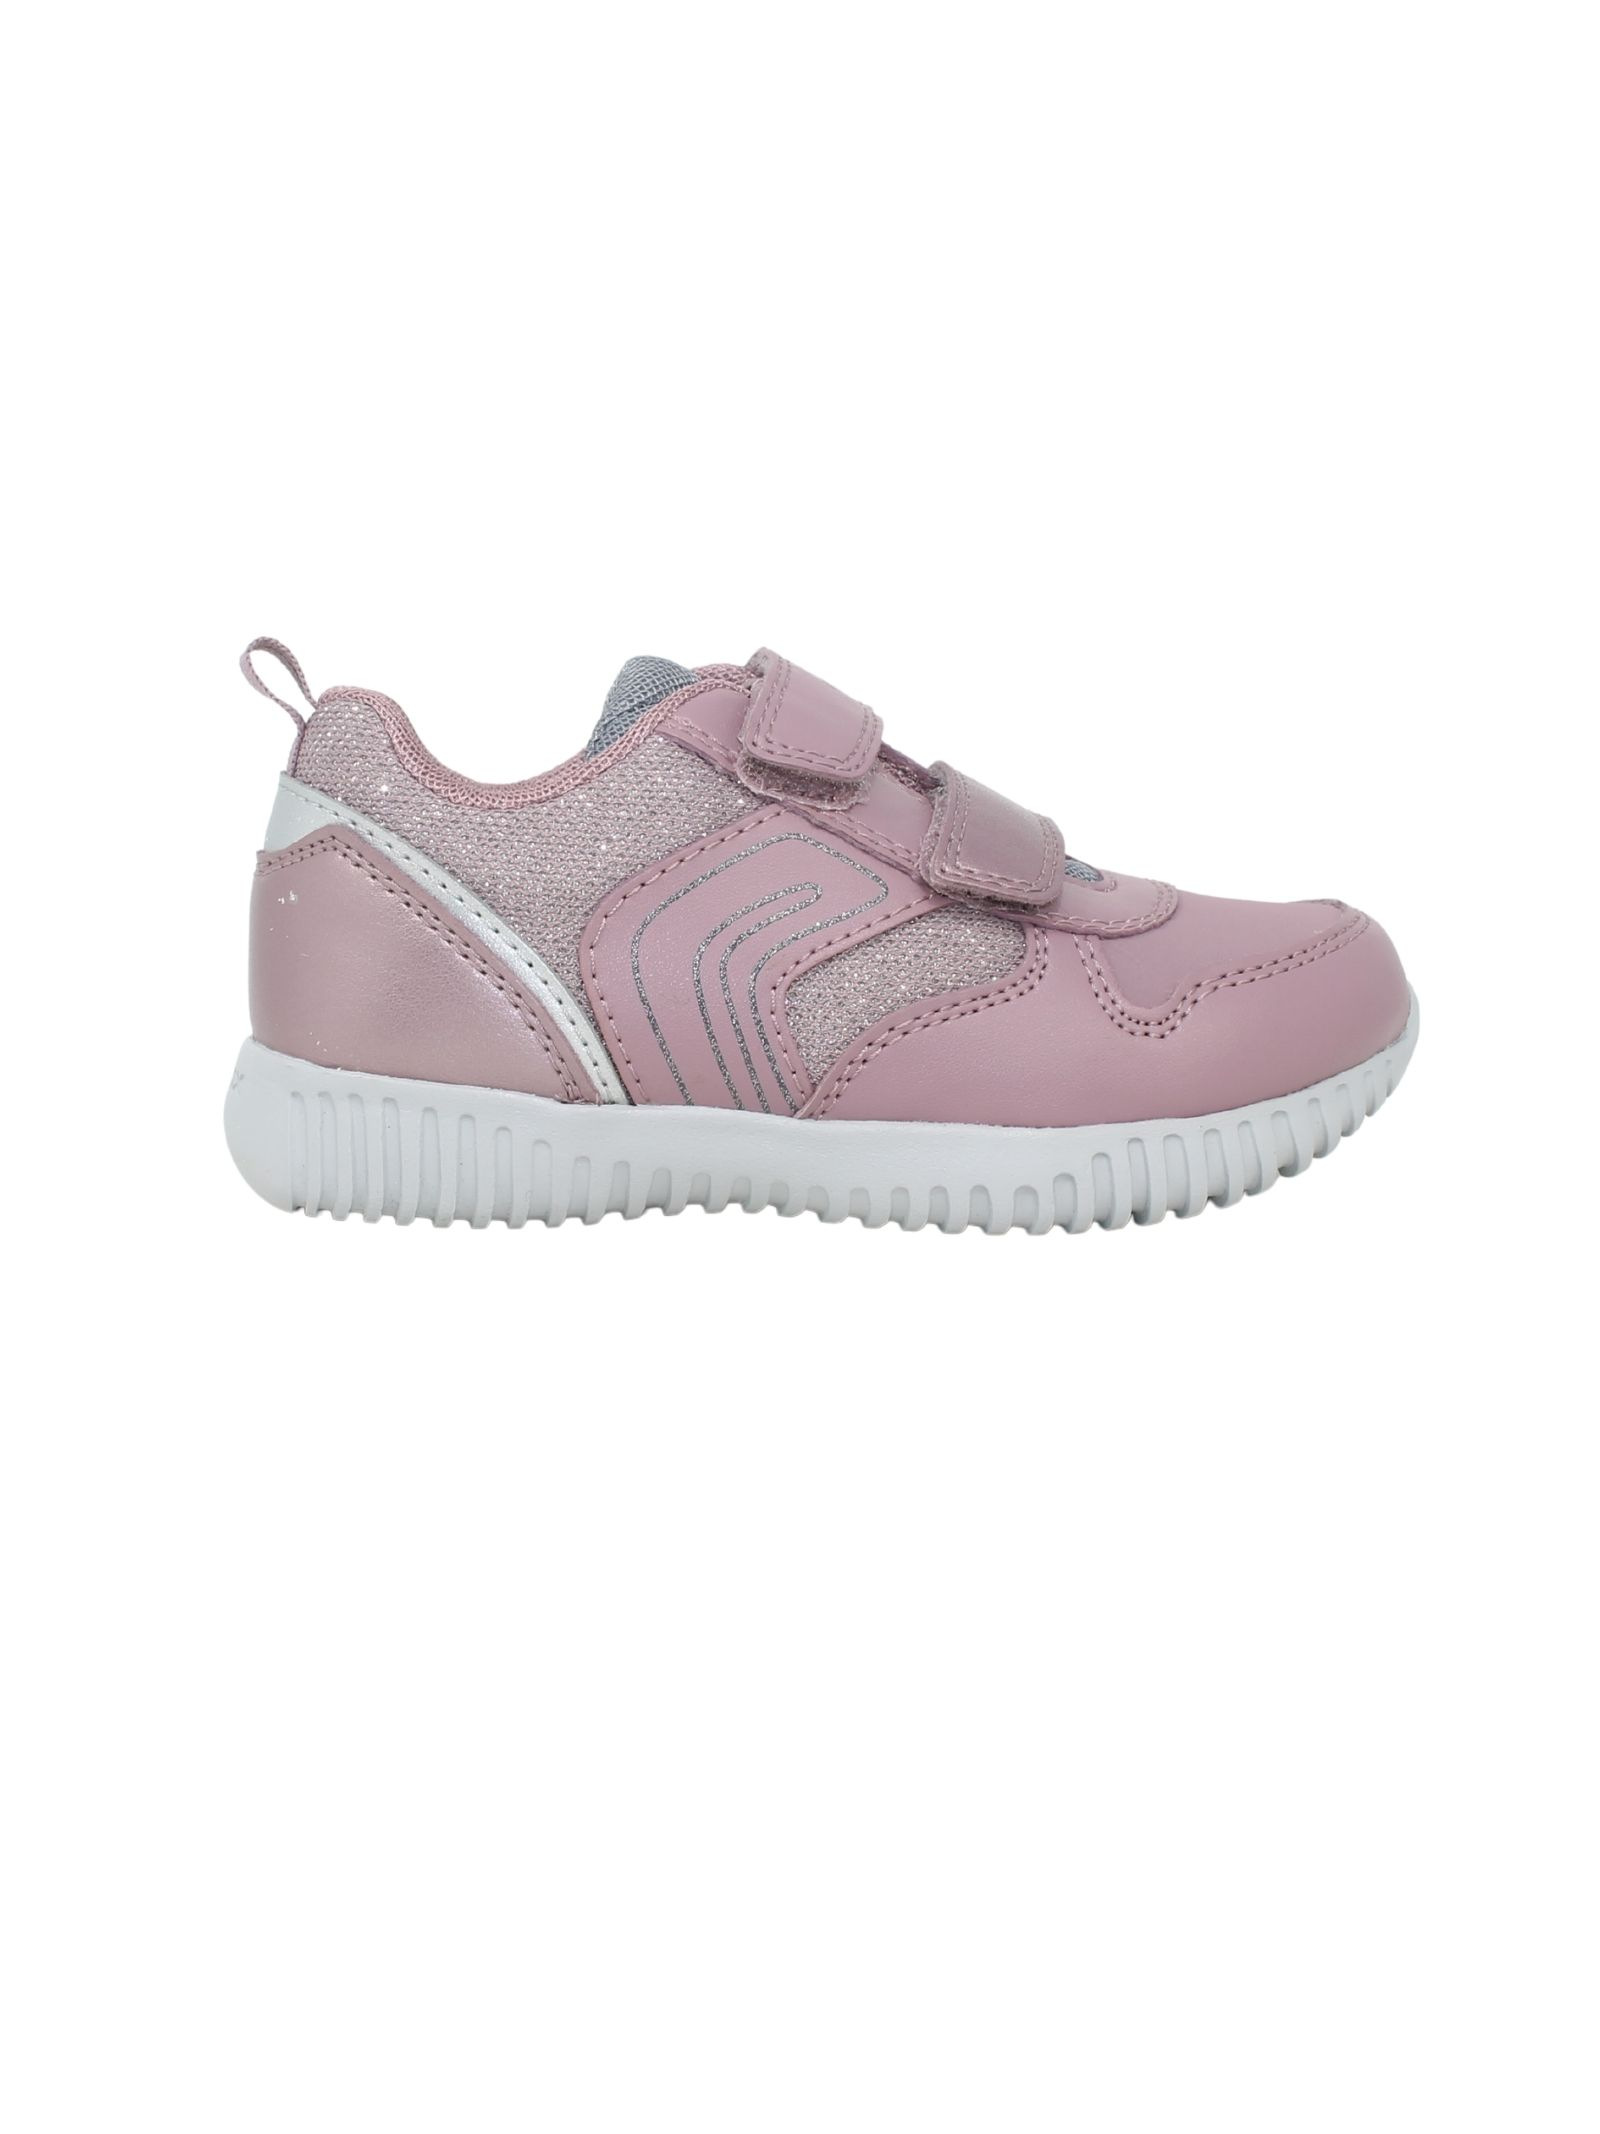 Sneakers Pink Silver Bambina GEOX KIDS | Sneakers | B161XA054ASC0514